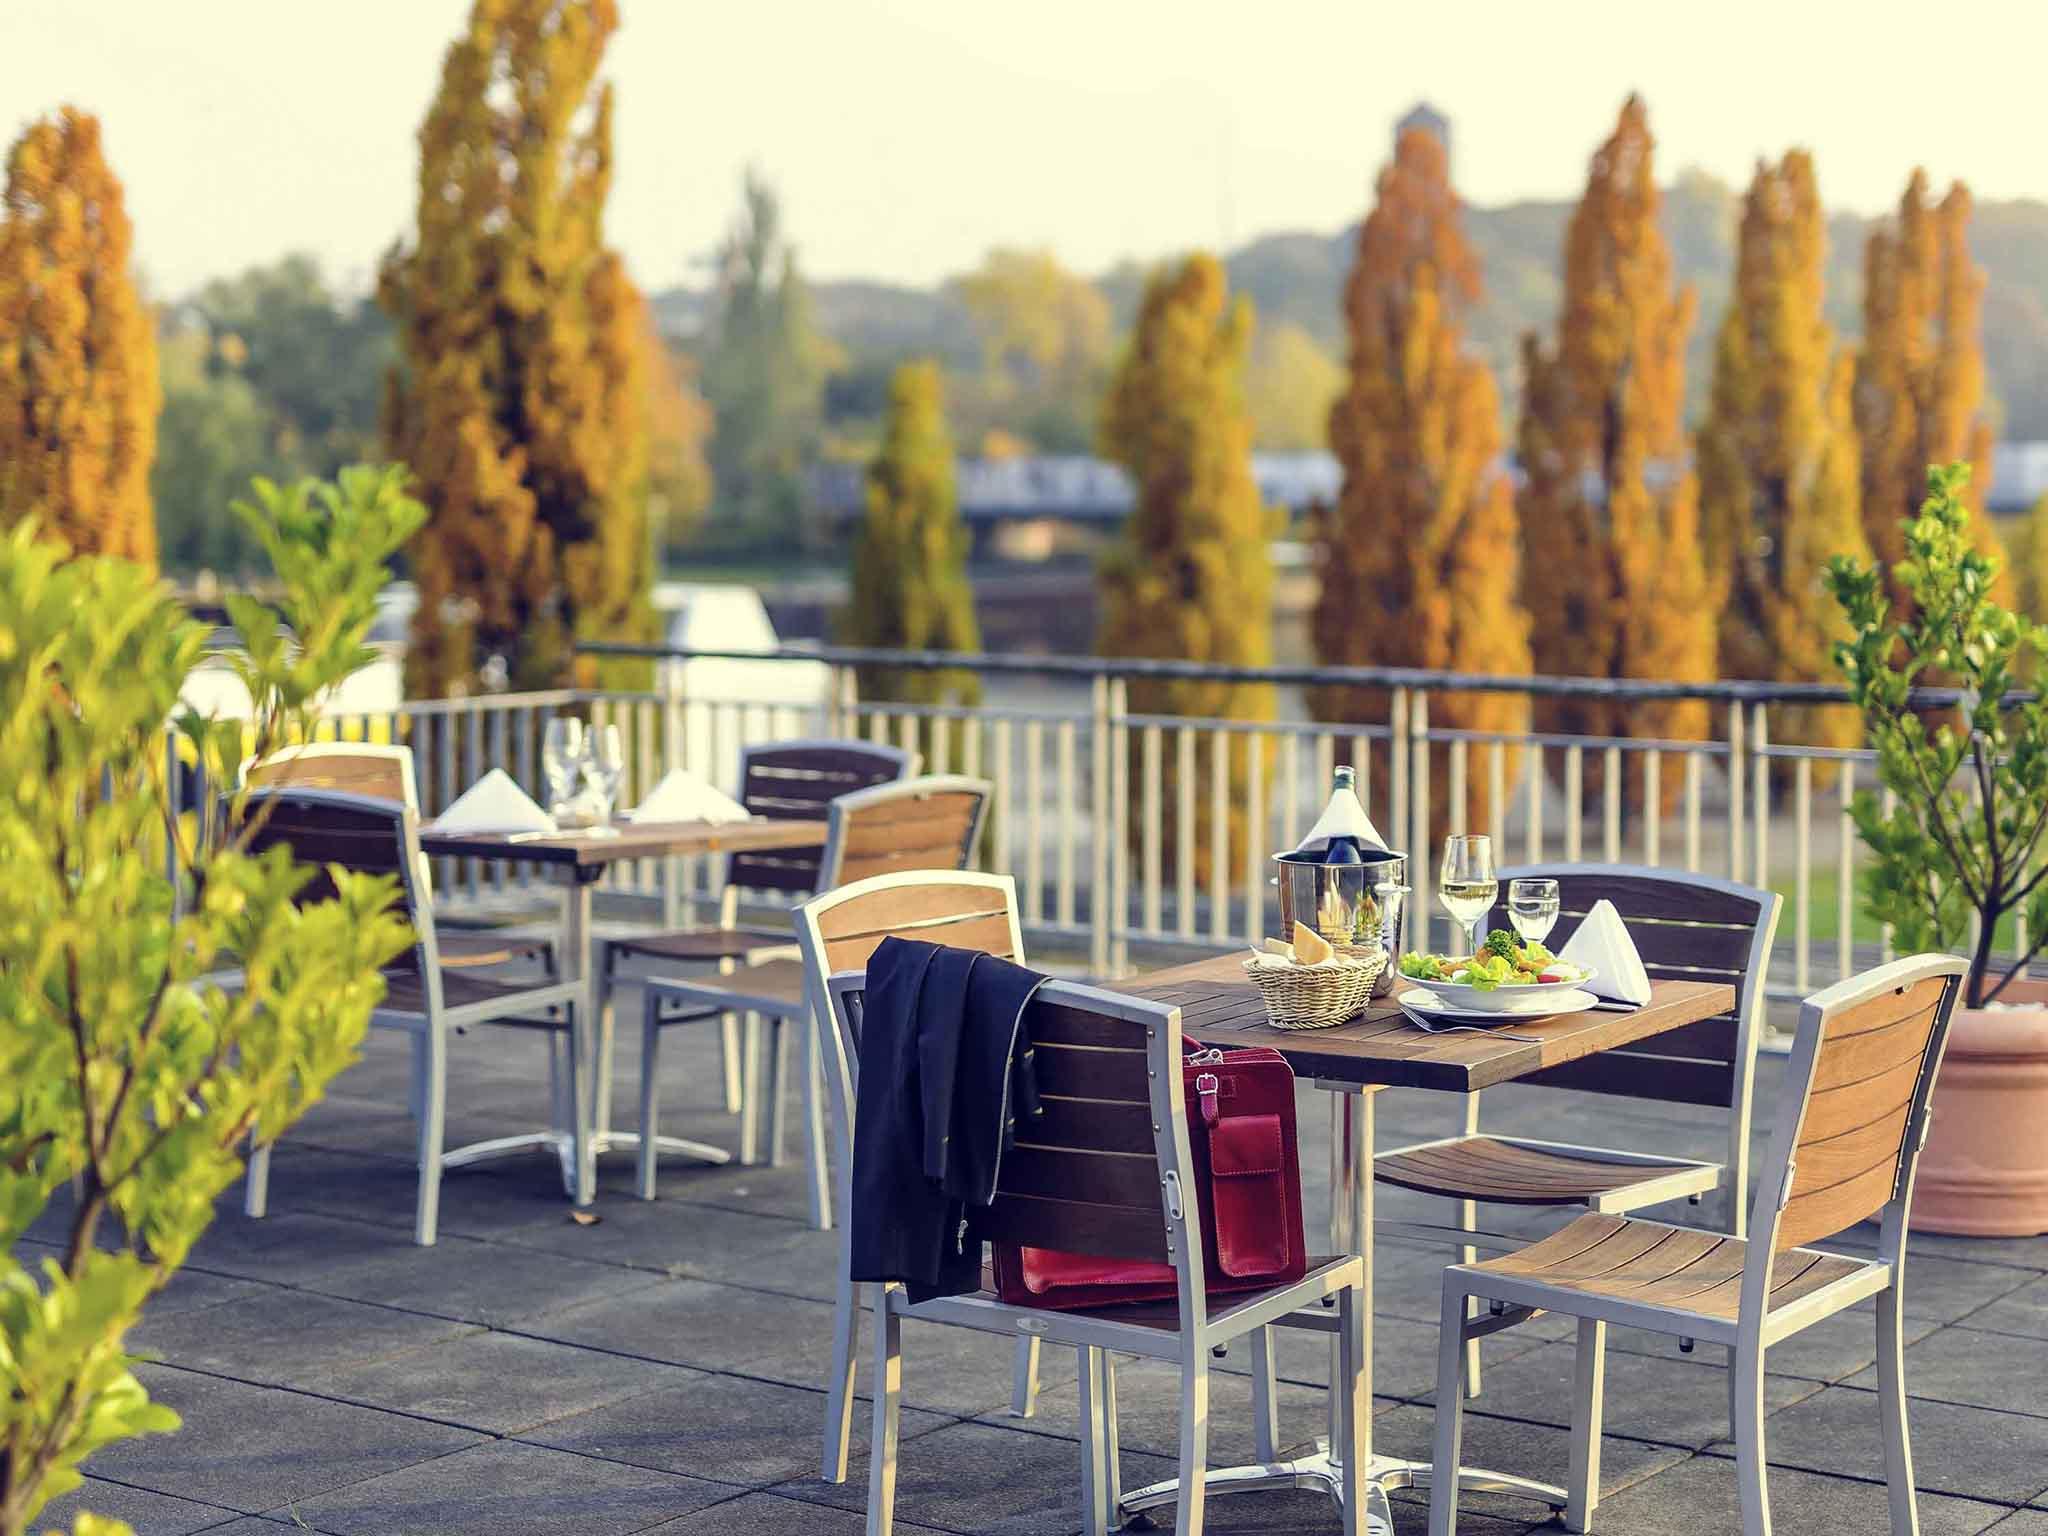 Mercure Hotel Potsdam City Book your hotel now